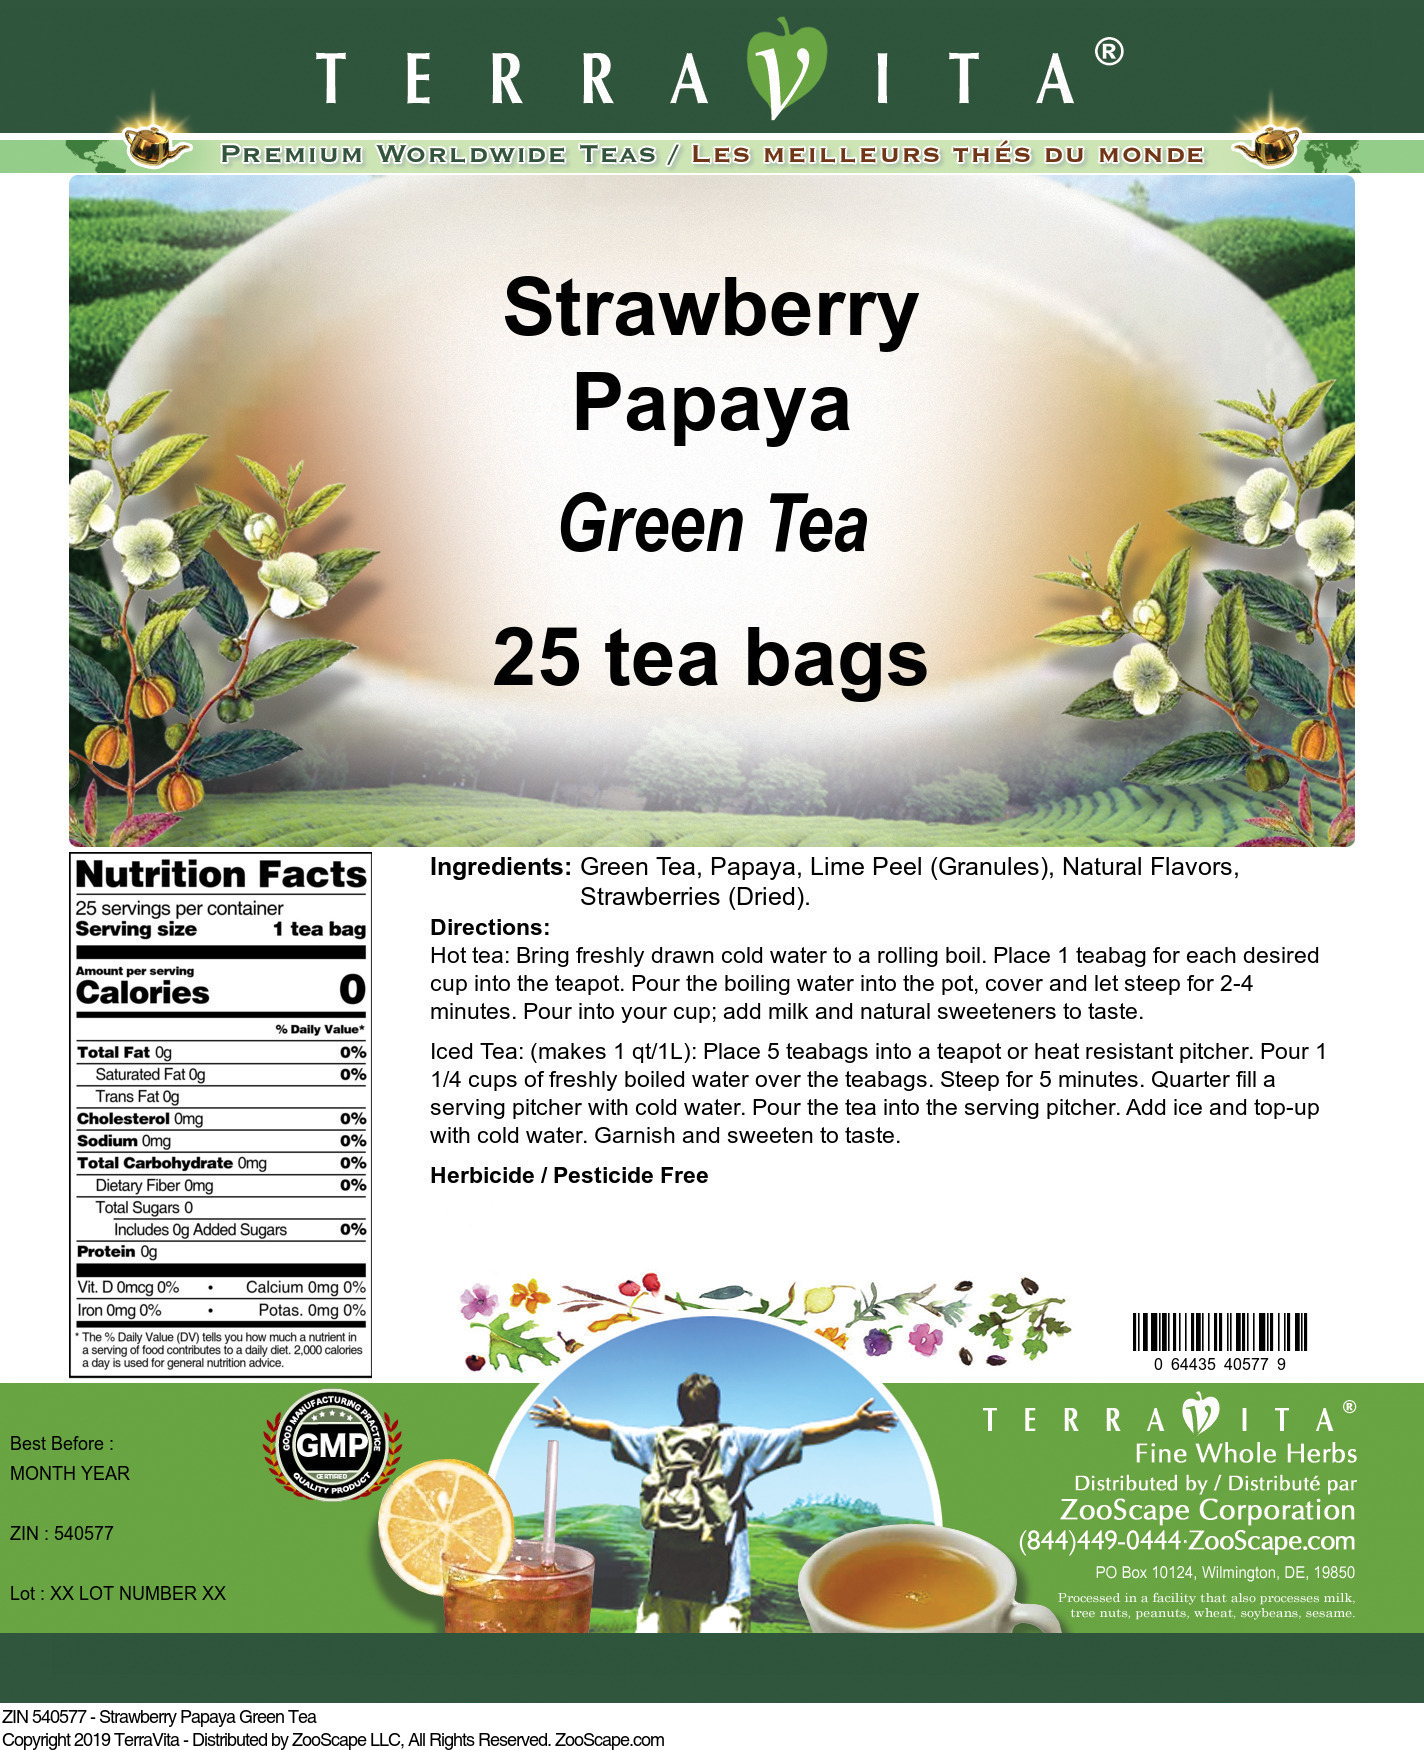 Strawberry Papaya Green Tea